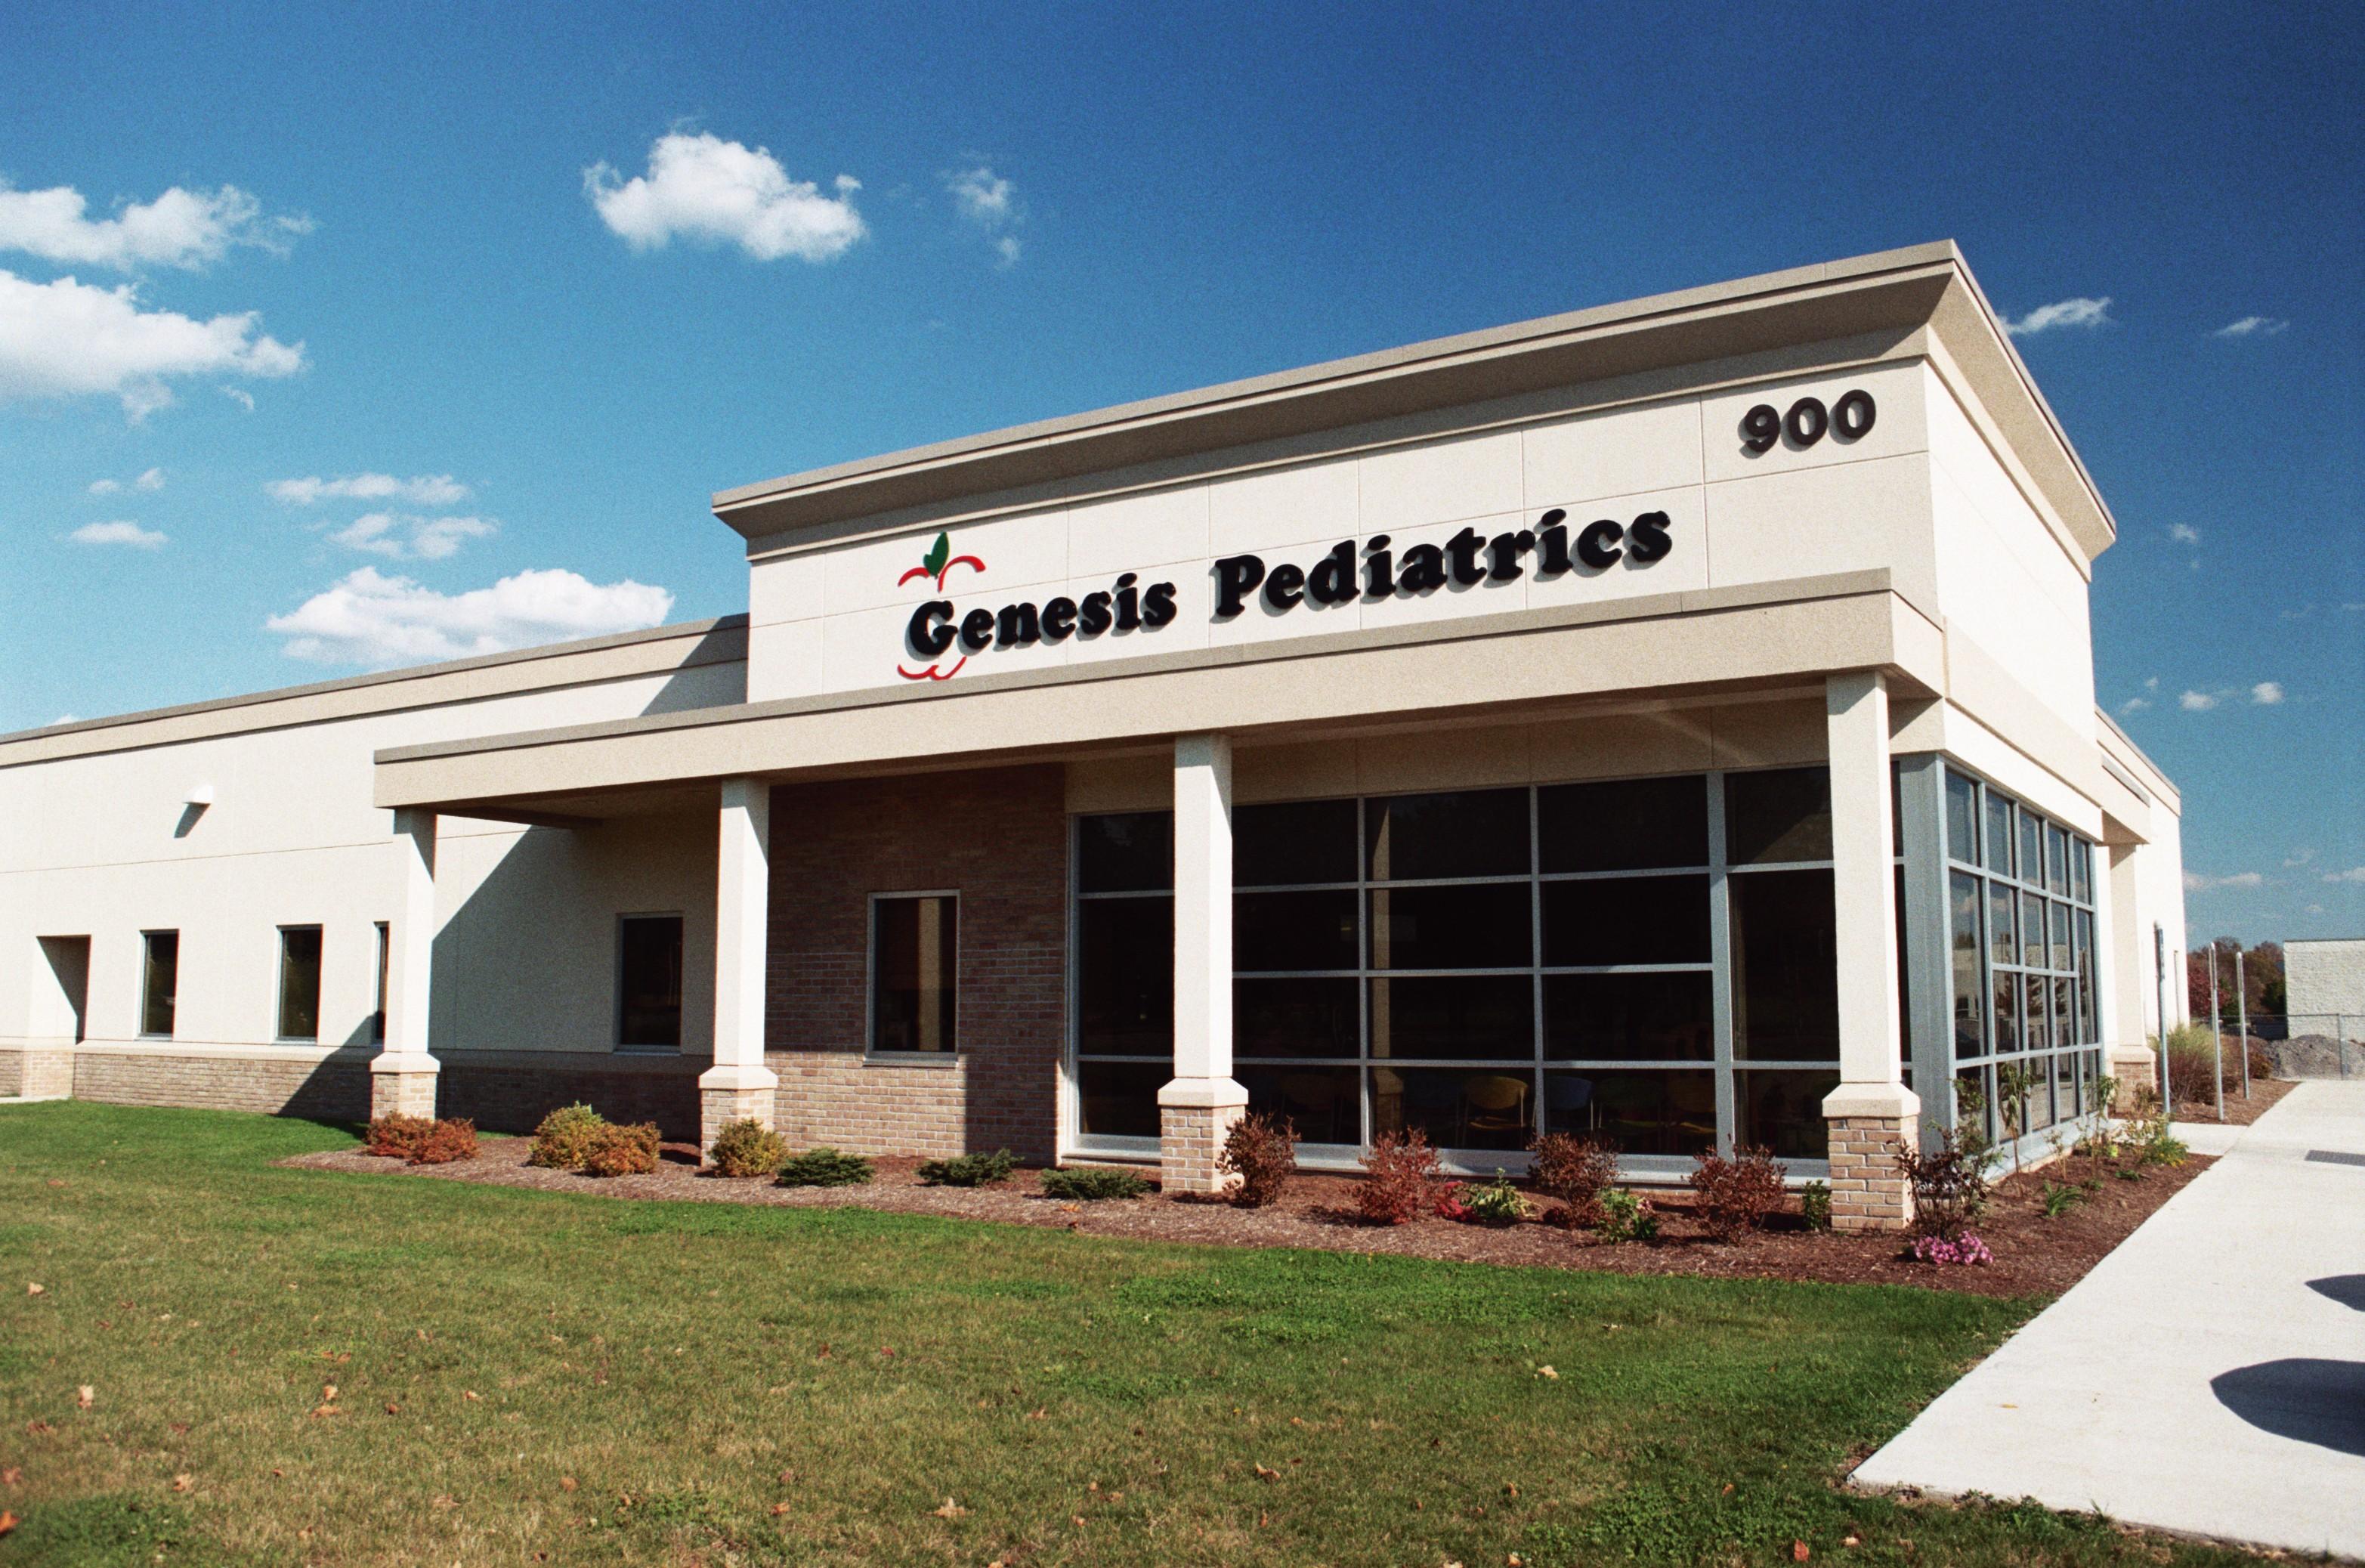 Genesis Pediatrics